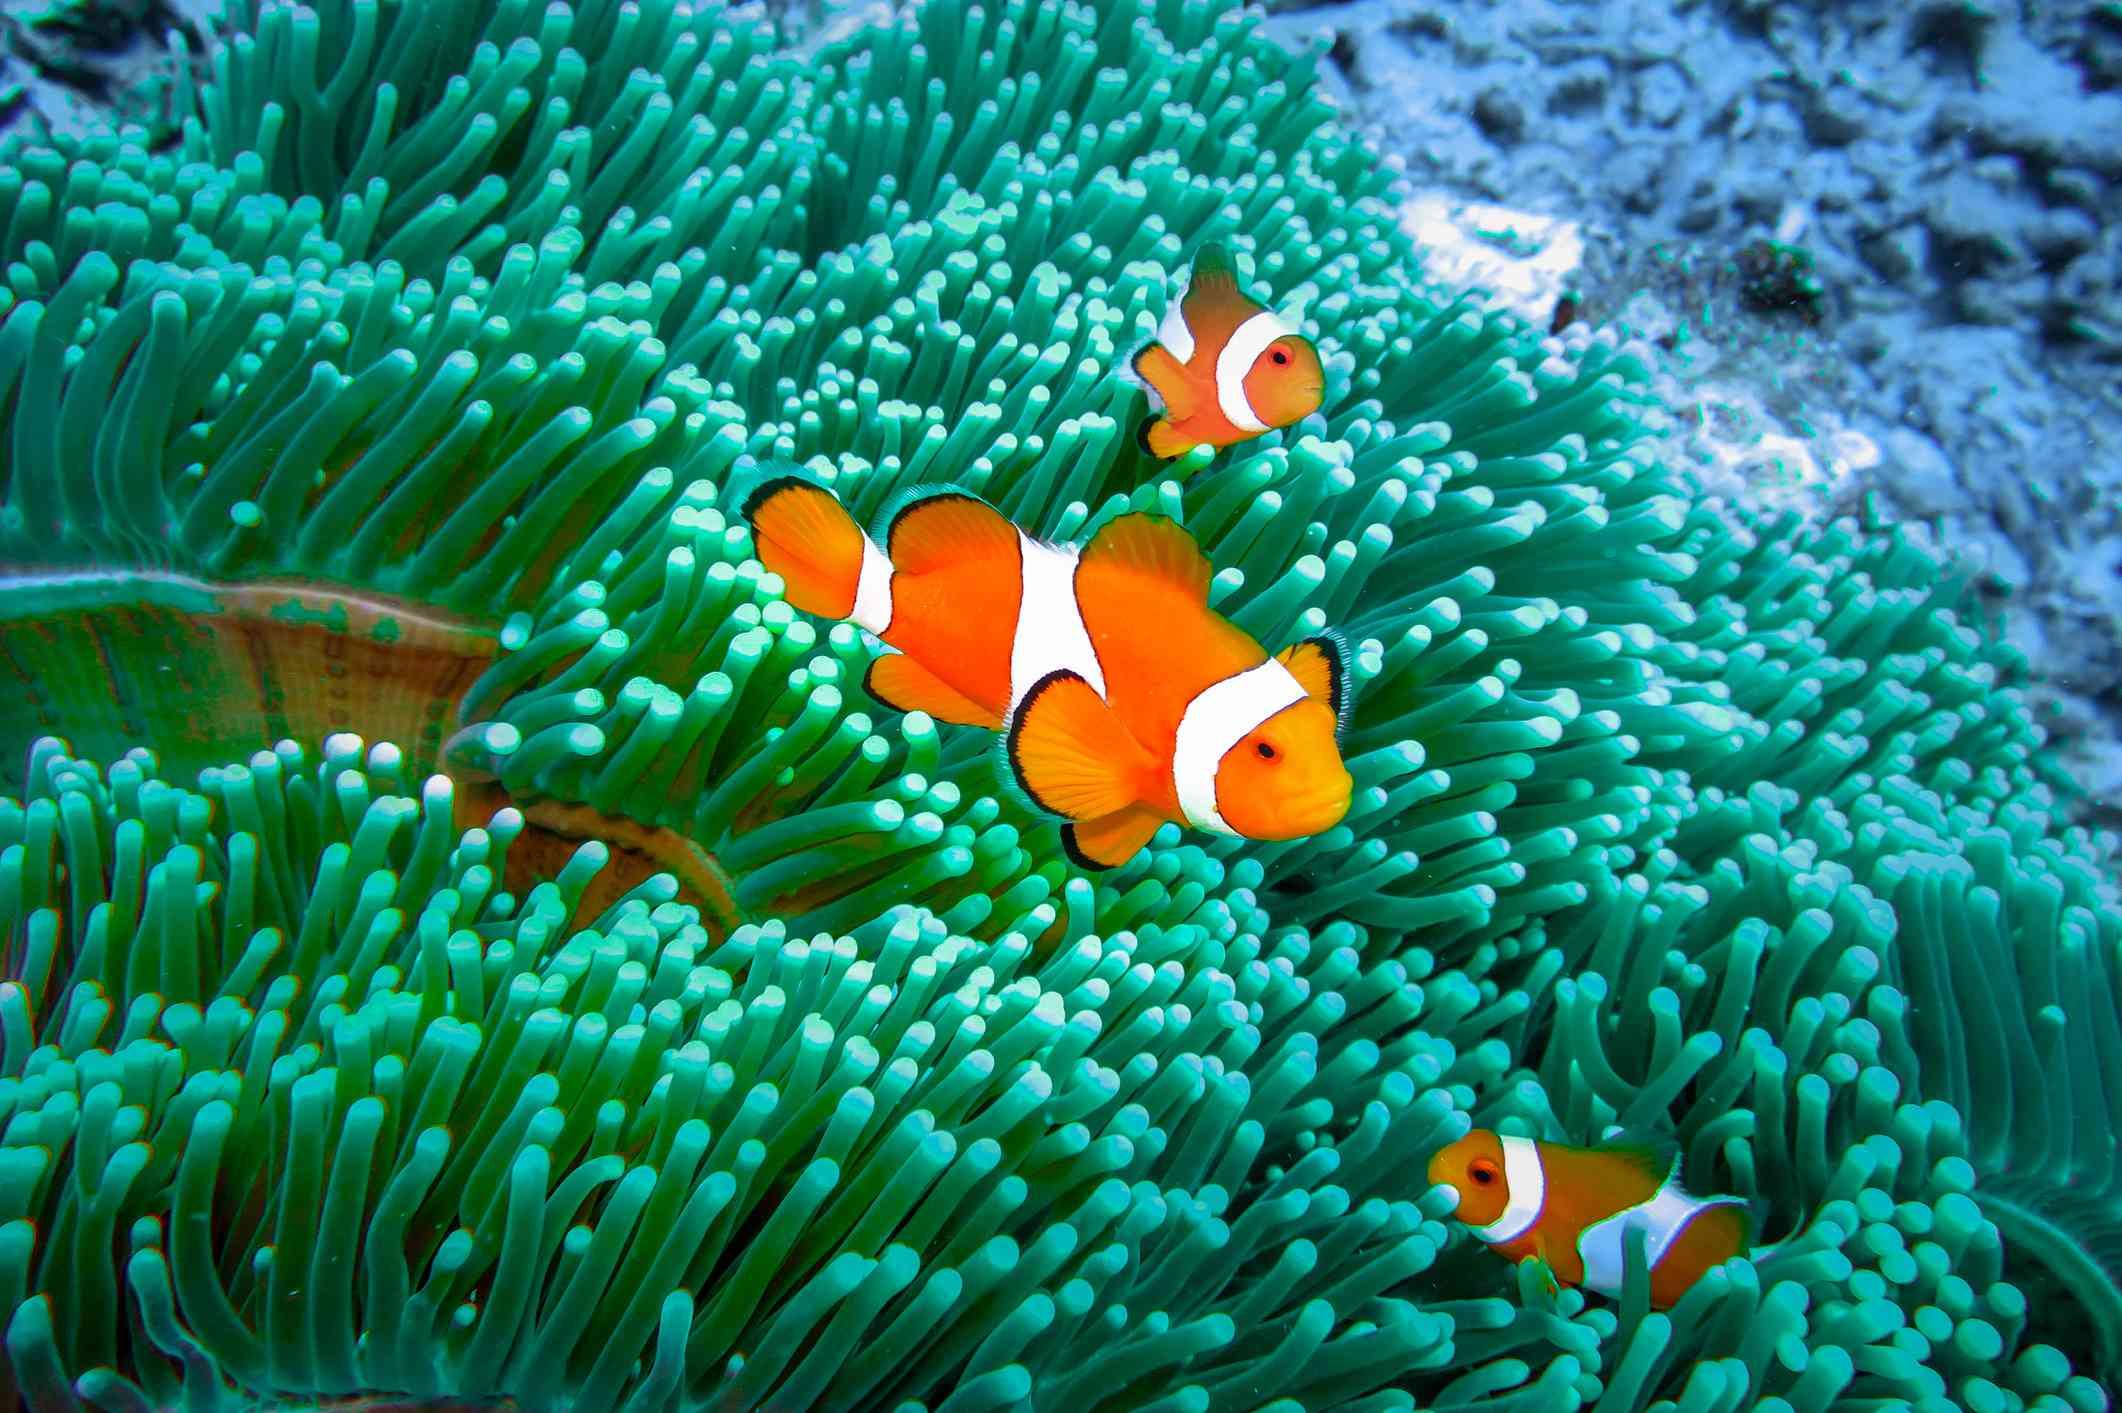 Three orange and white clownfish in a sea of green anemone.